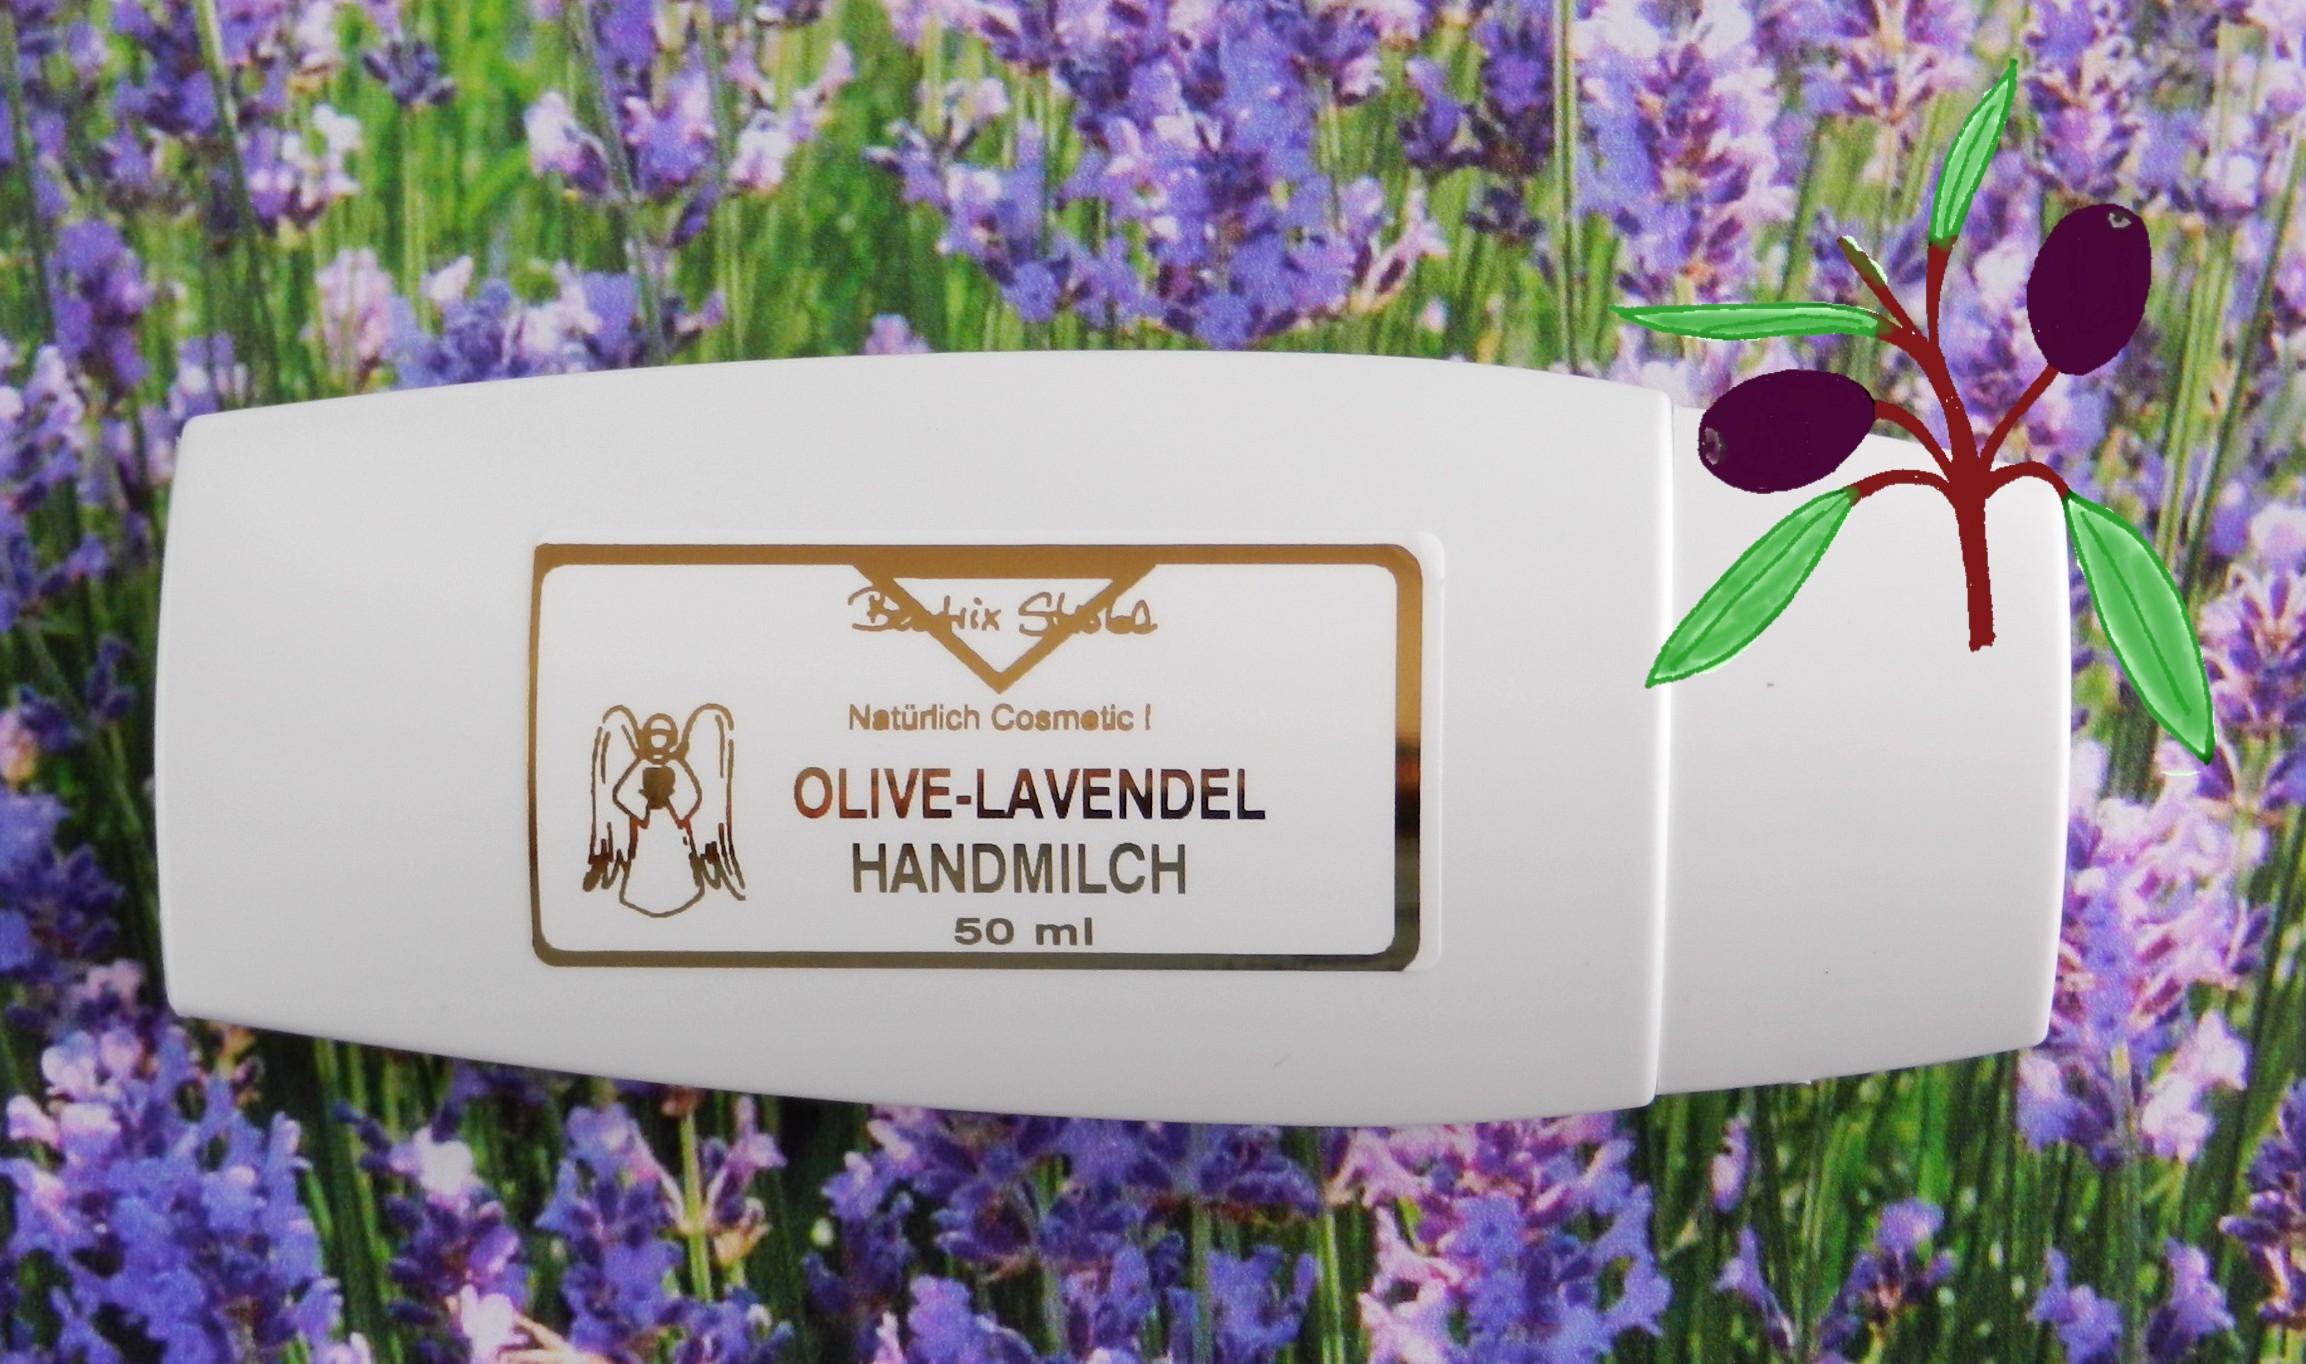 OLIVE-LAVENDEL HANDMILCH